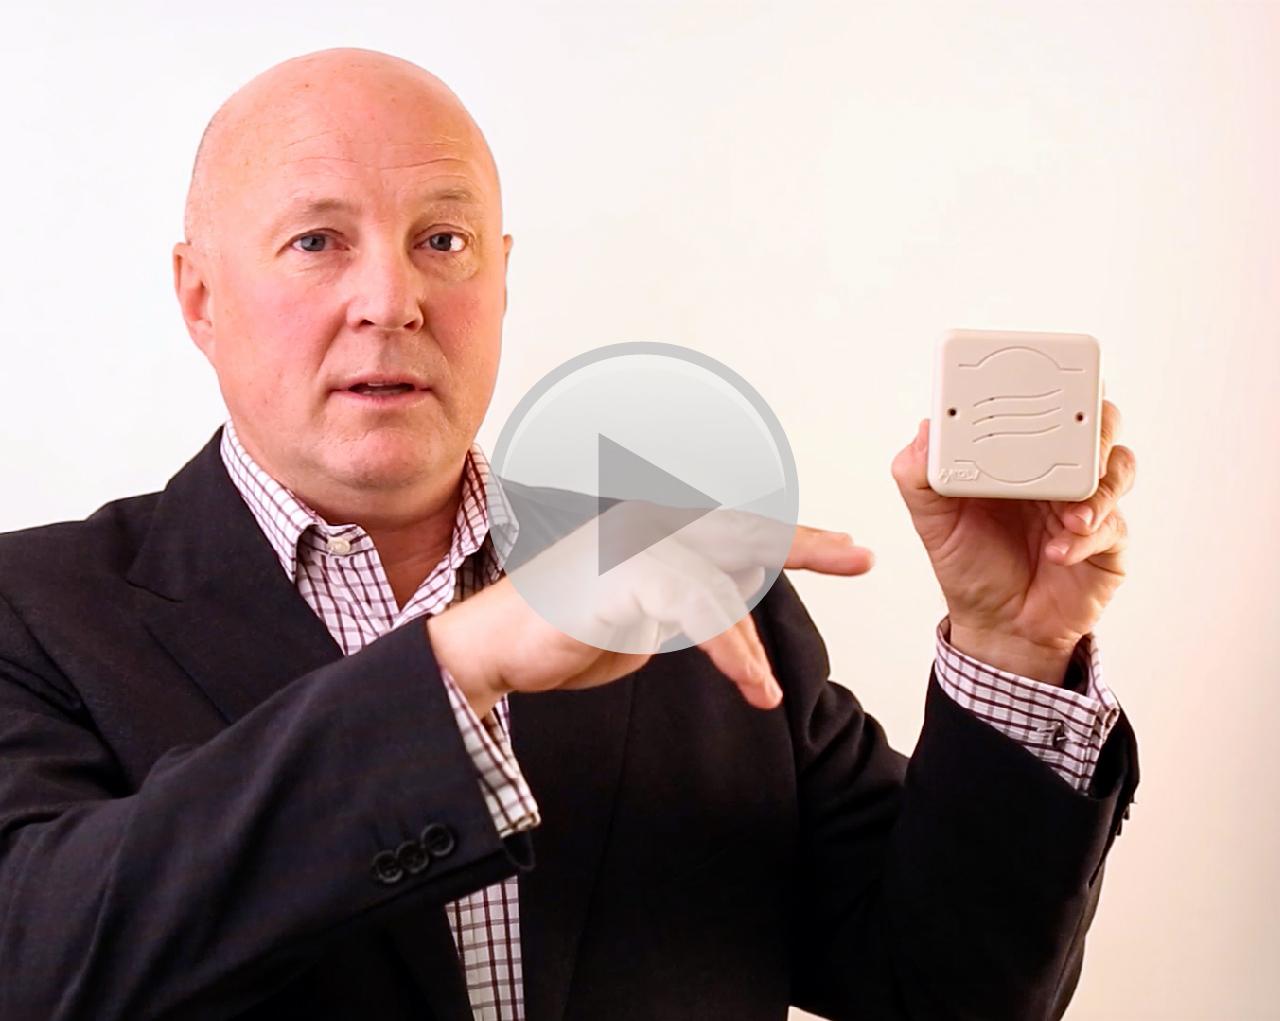 David Innes explains the features of Radostat on-demand mitigation.